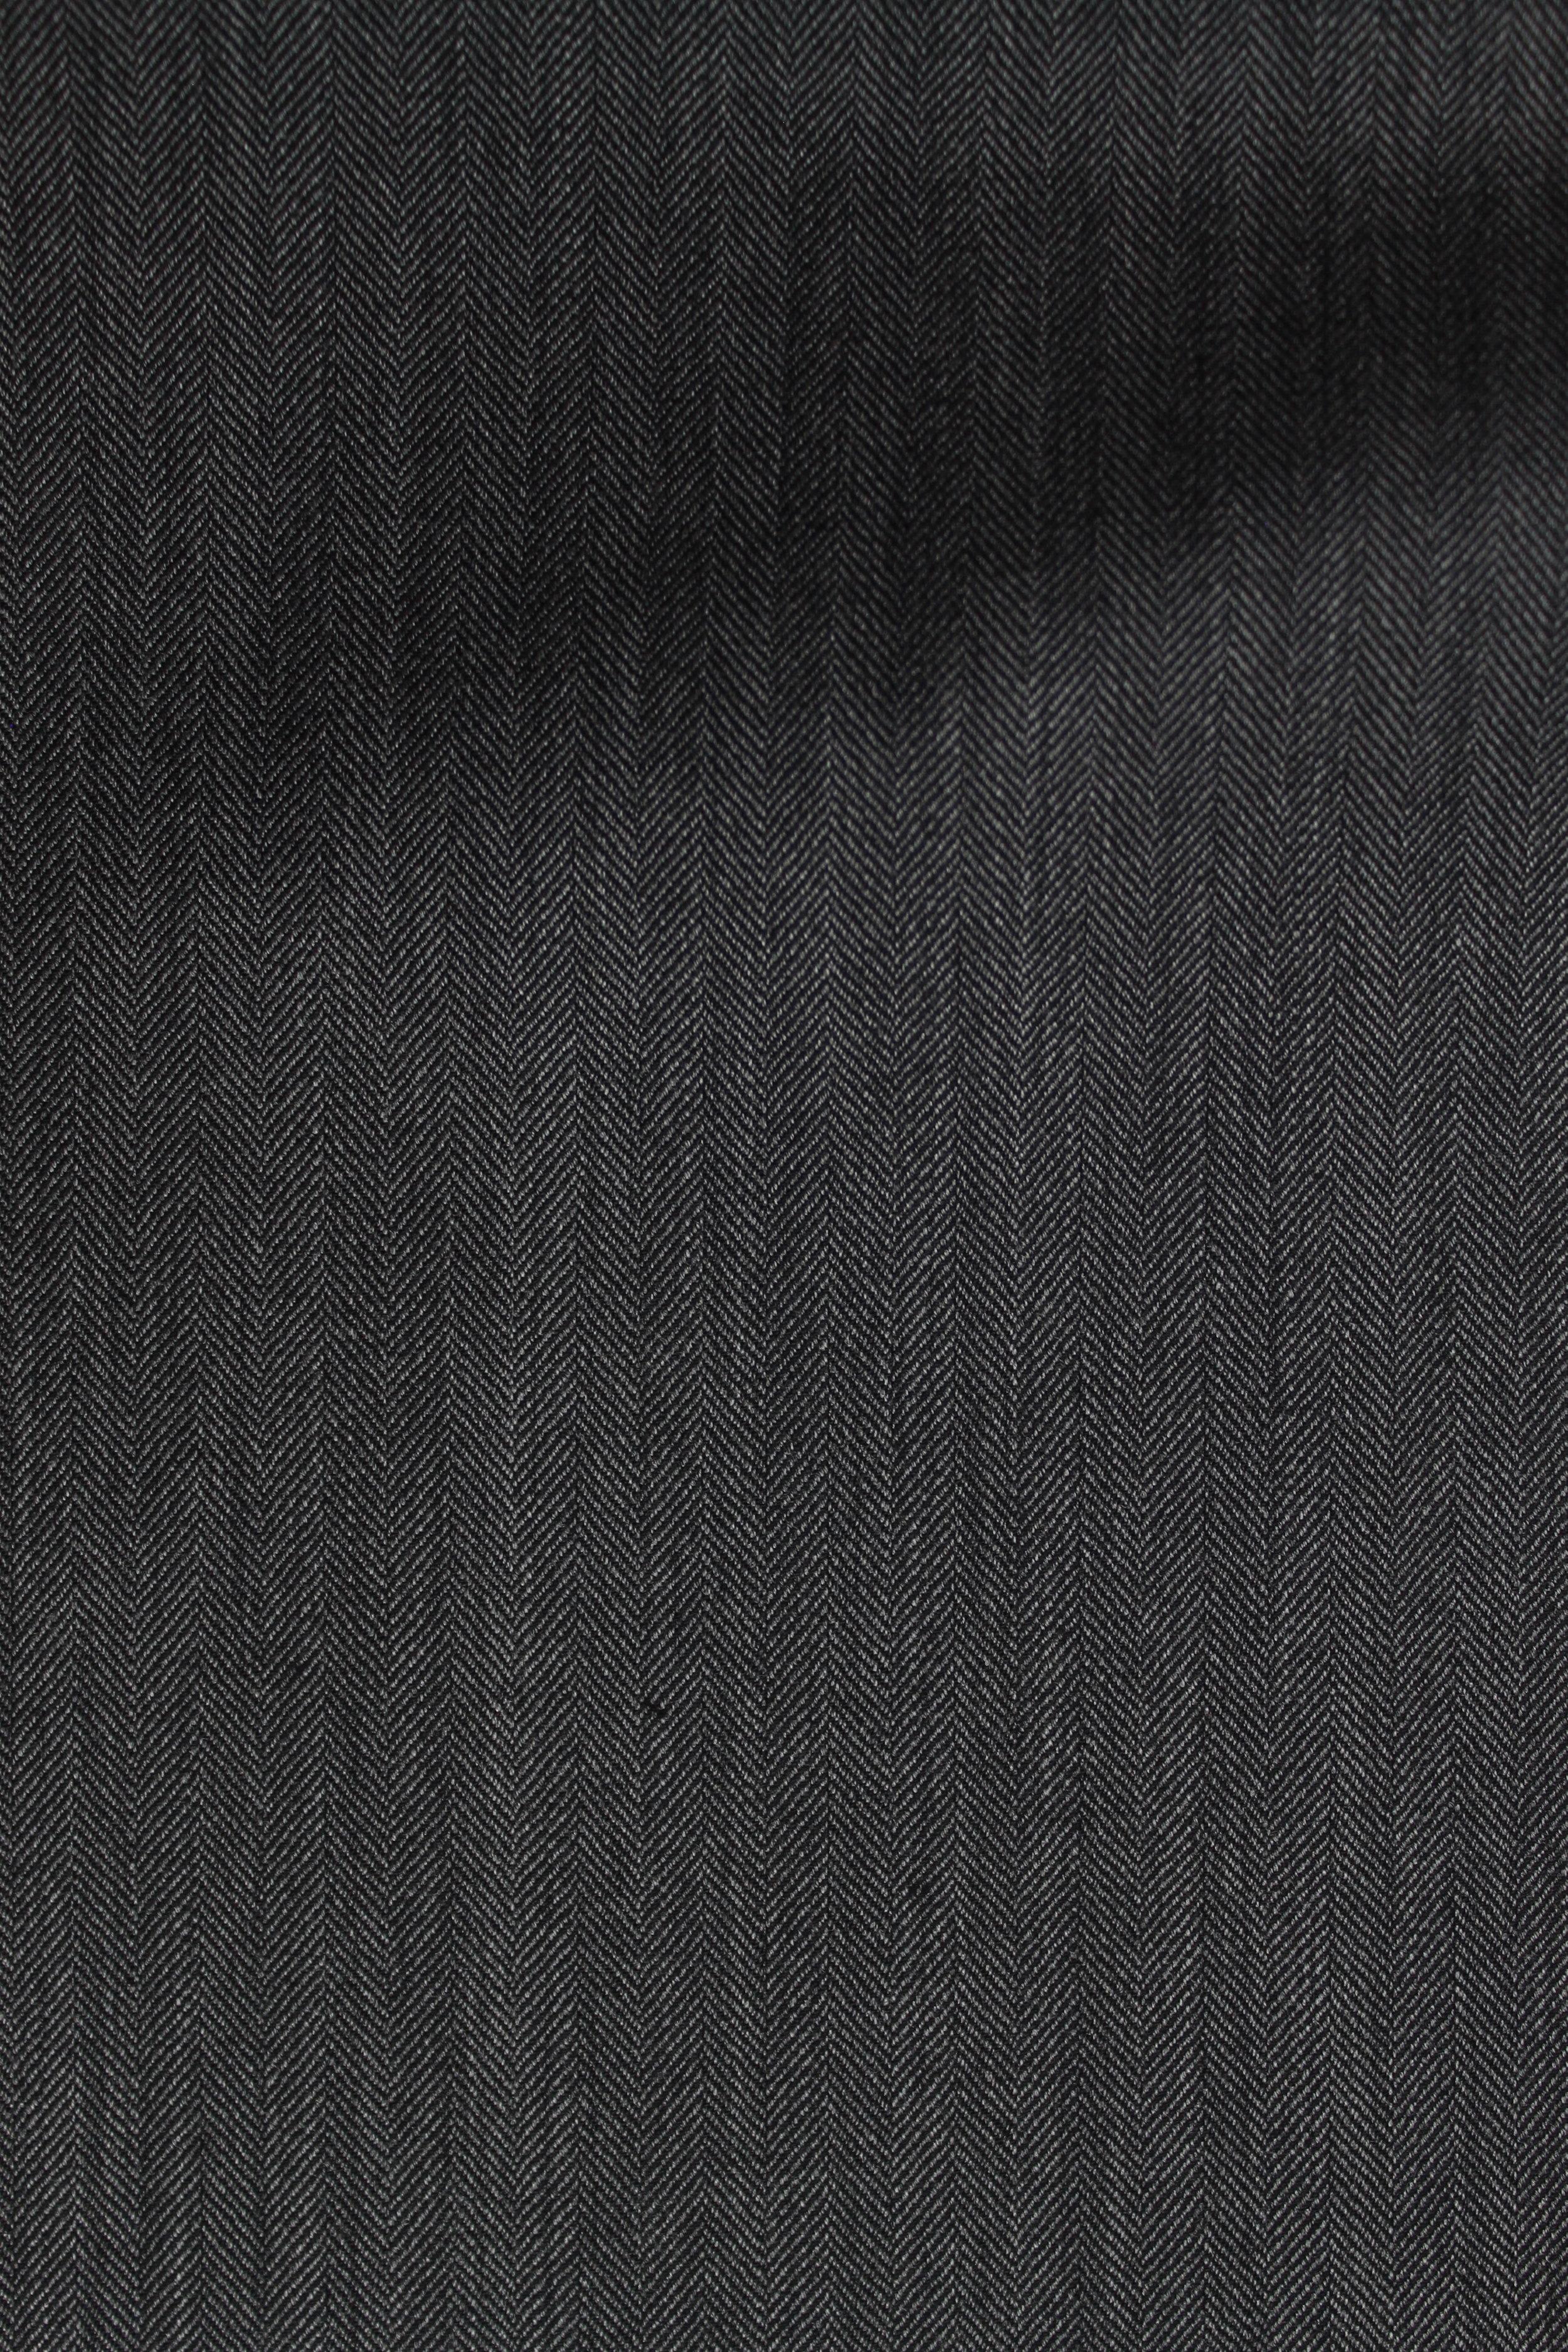 7403 Gray Herringbone 280g.JPG